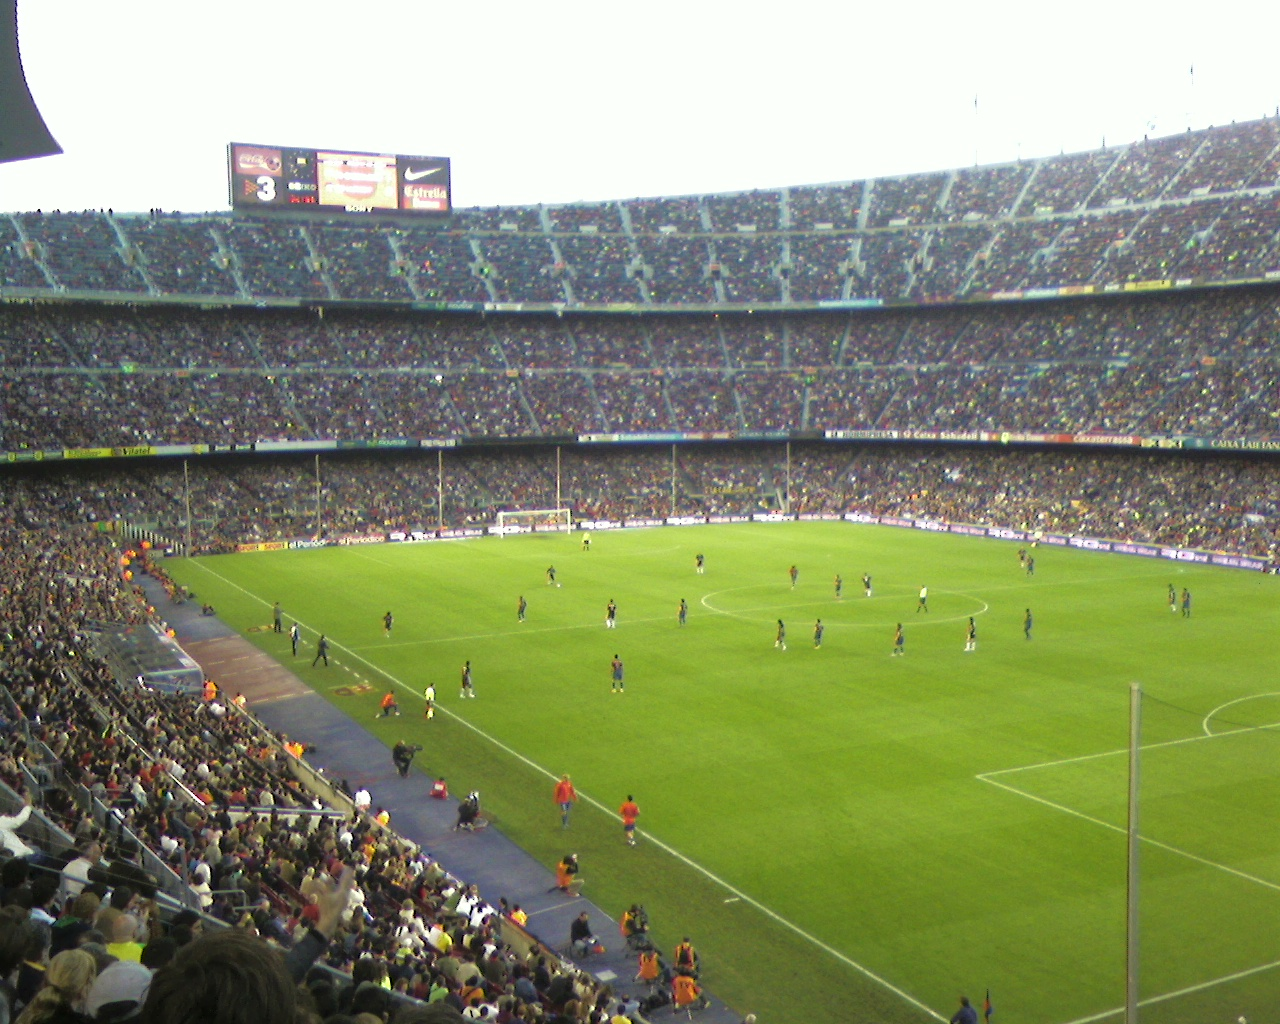 grösste stadion der welt